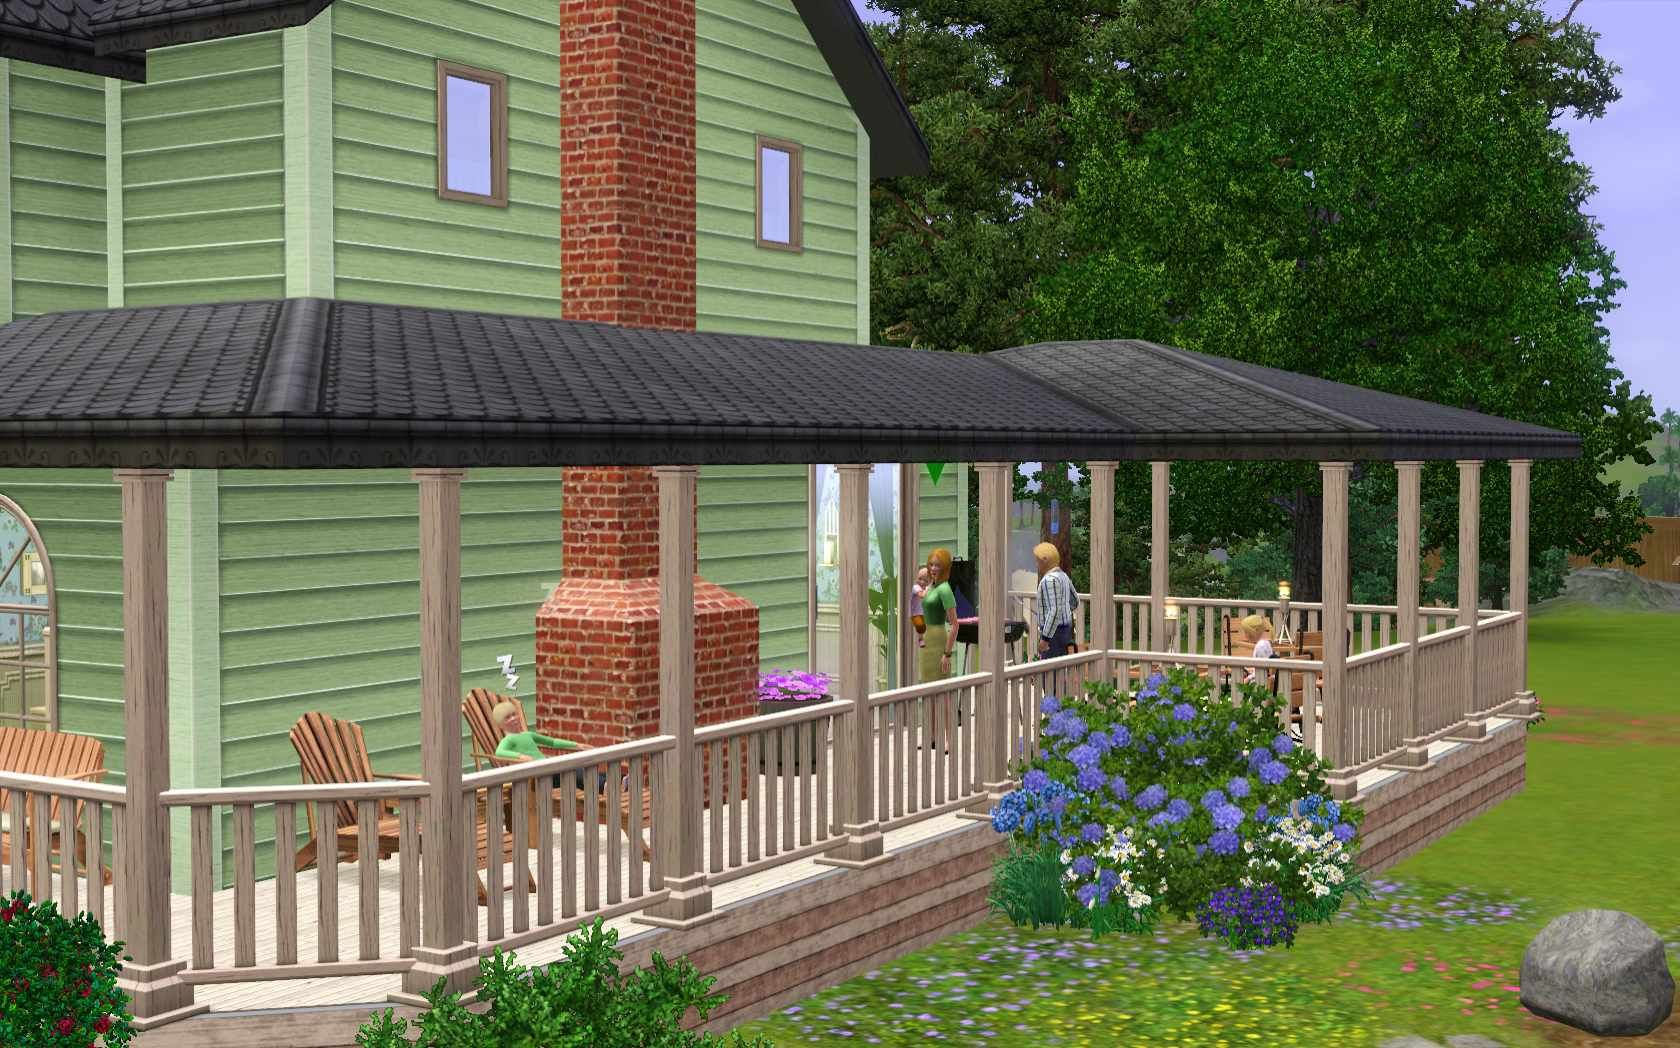 Sims 3 - Wrap around porch | Sims 3 houses plans, House ...